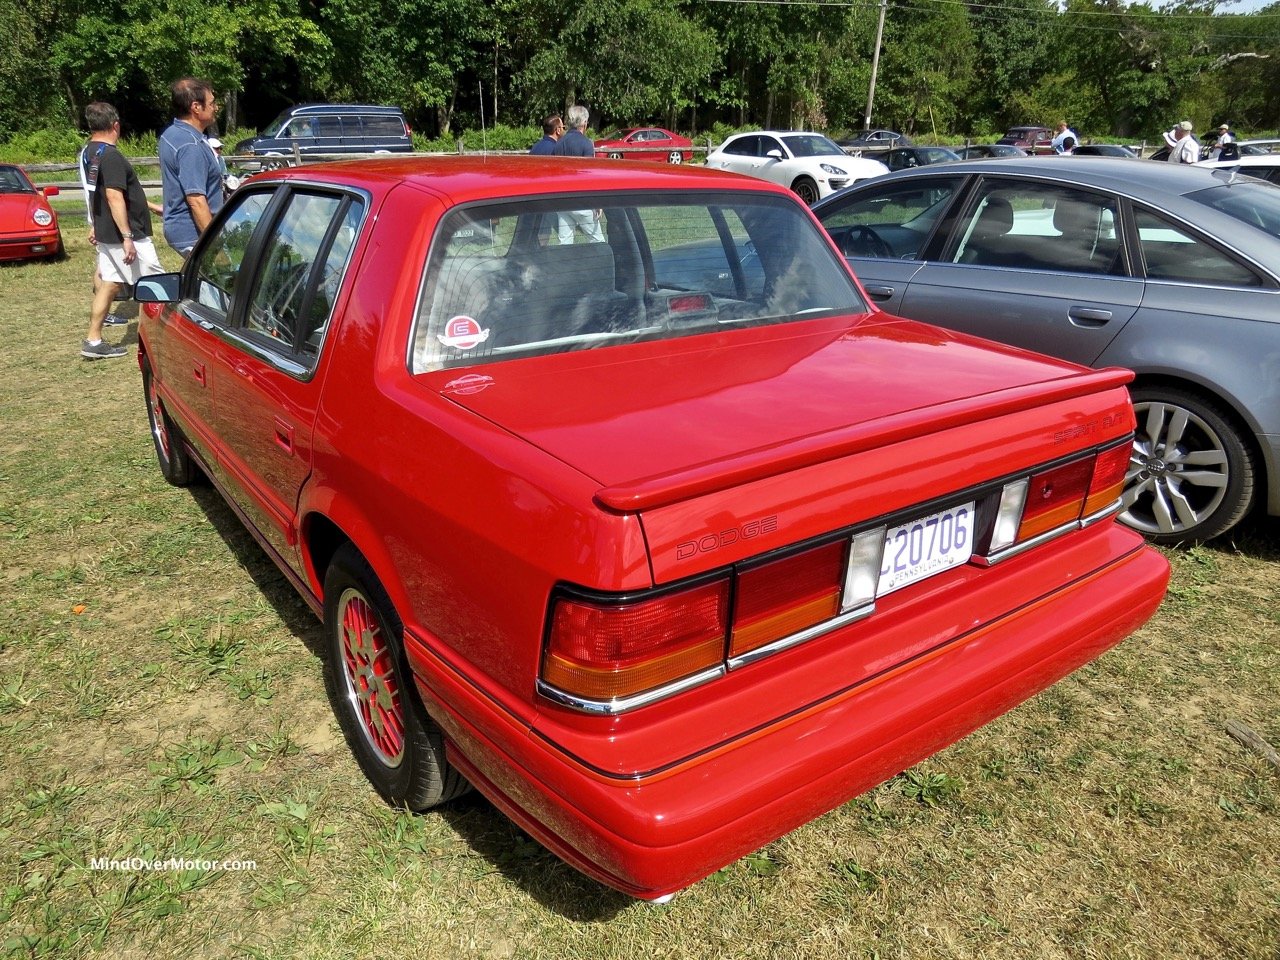 1991 Dodge Spirit R:T Rear 2